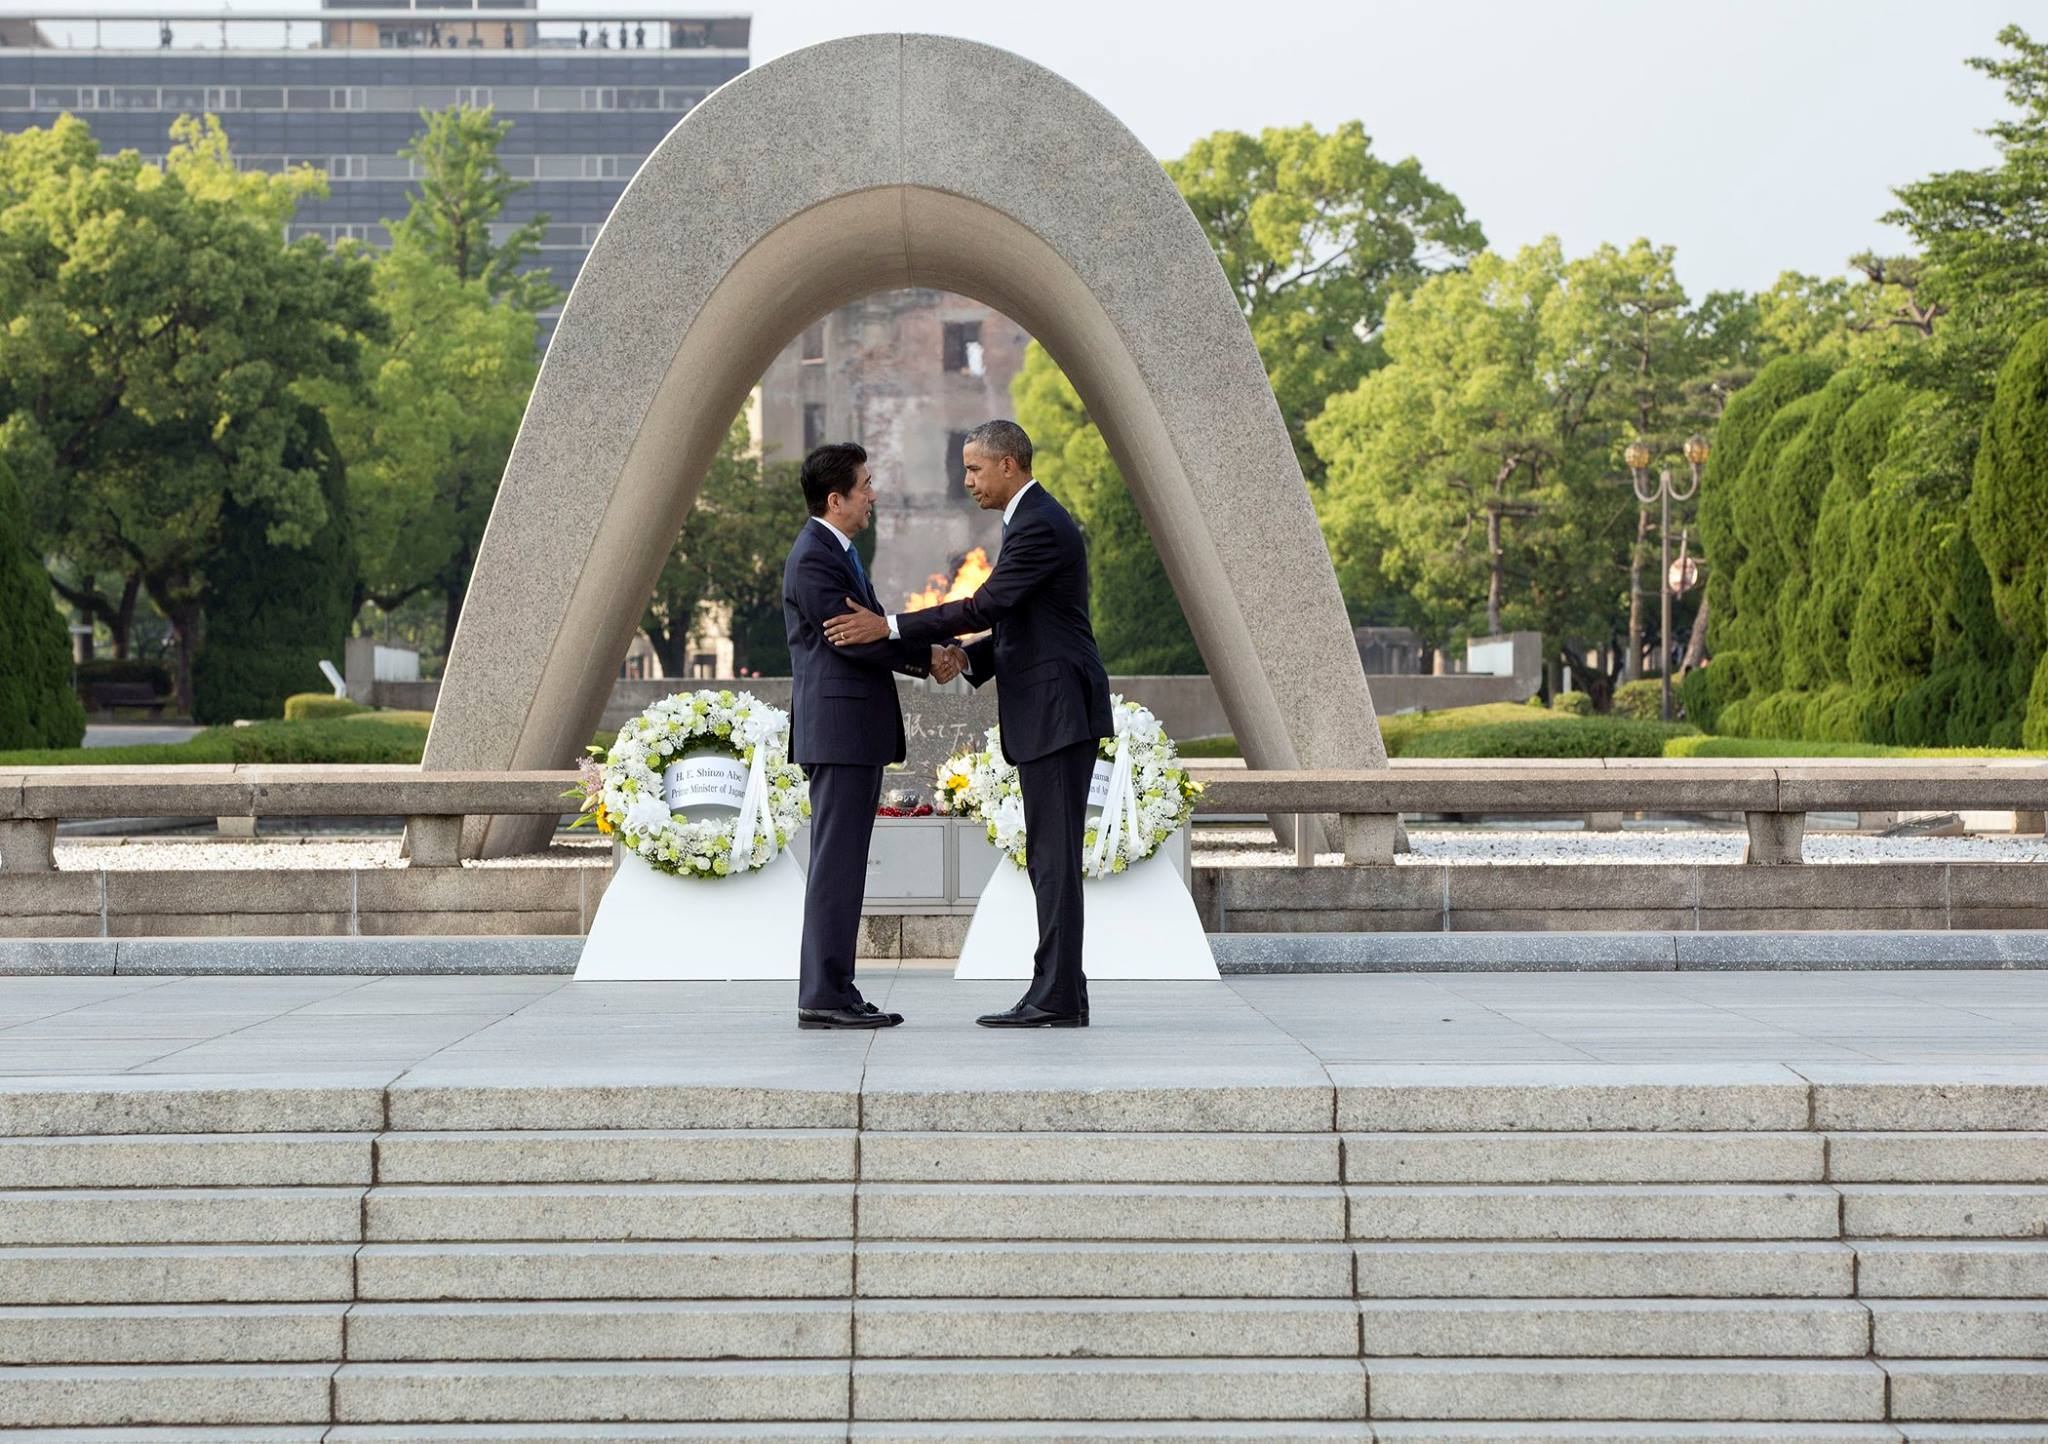 Prime Minister Shinzō Abe and President Barack Obama shaking hands at the Hiroshima Peace Memorial Park